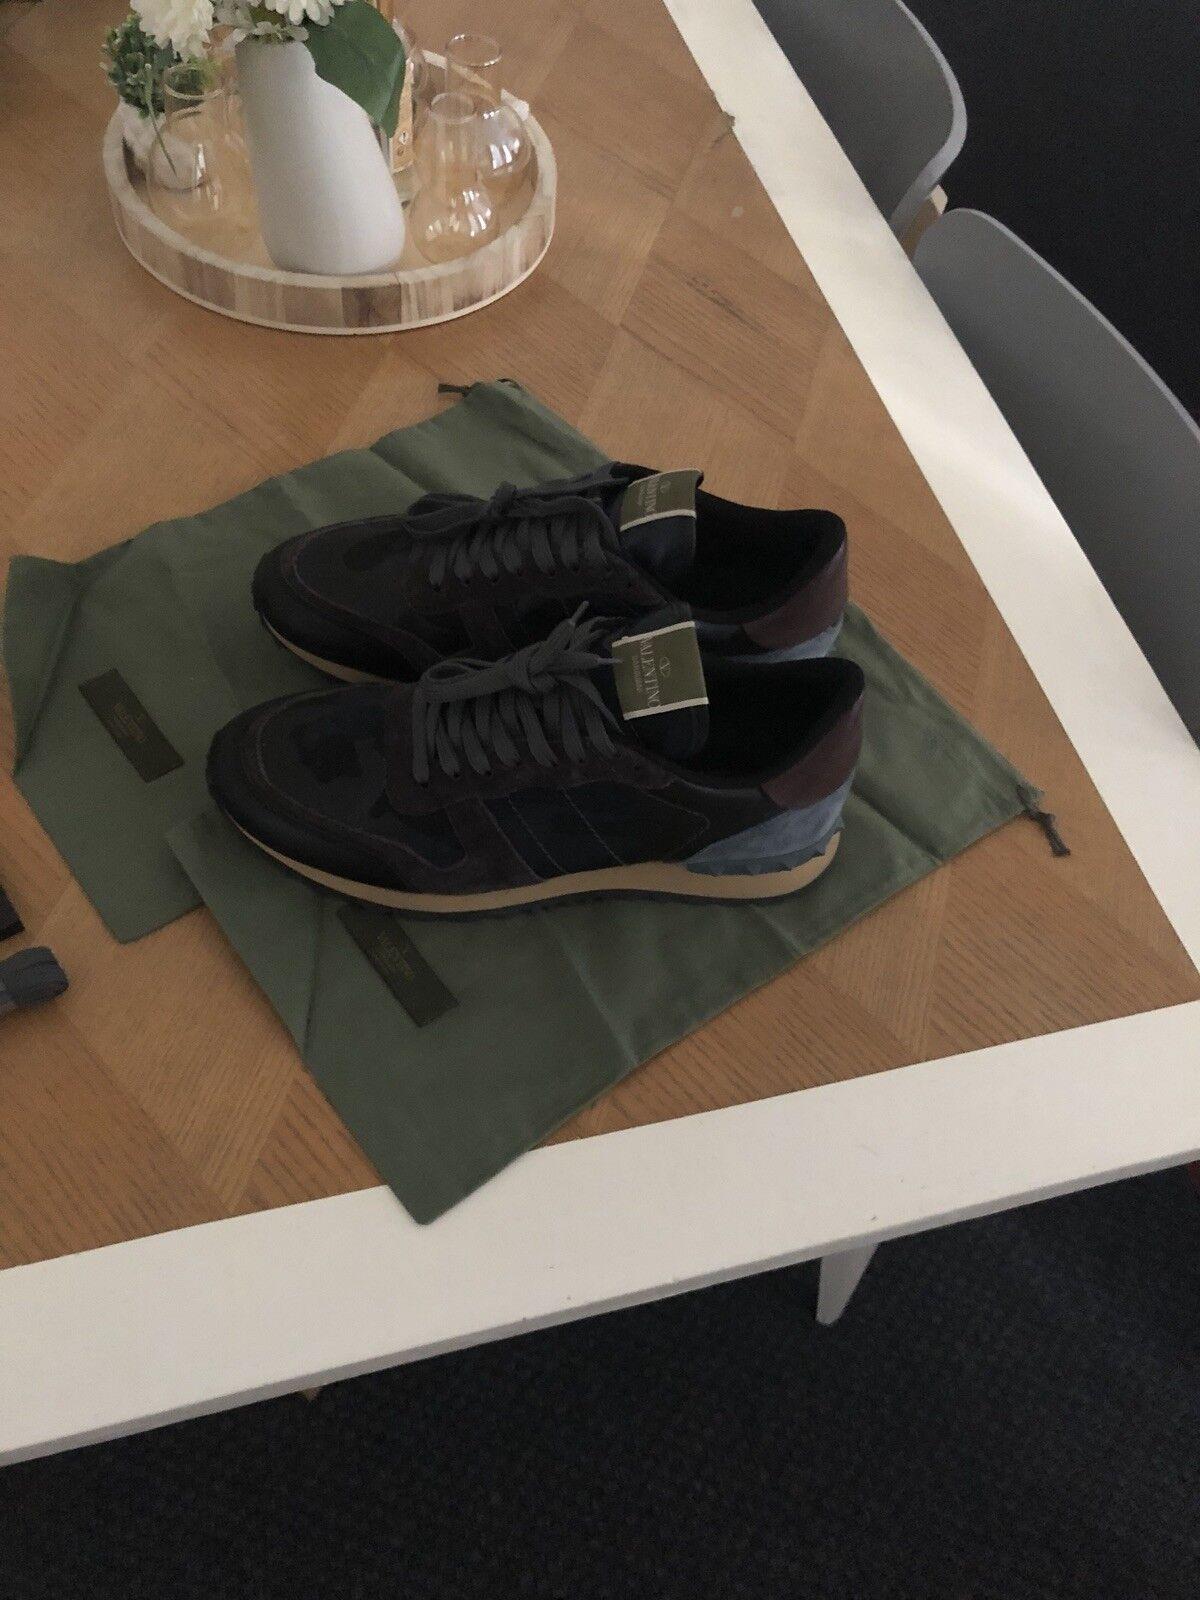 Valentino scarpe da ginnastica Rockrunner Tonal Marine Camo 10us 44 Eu